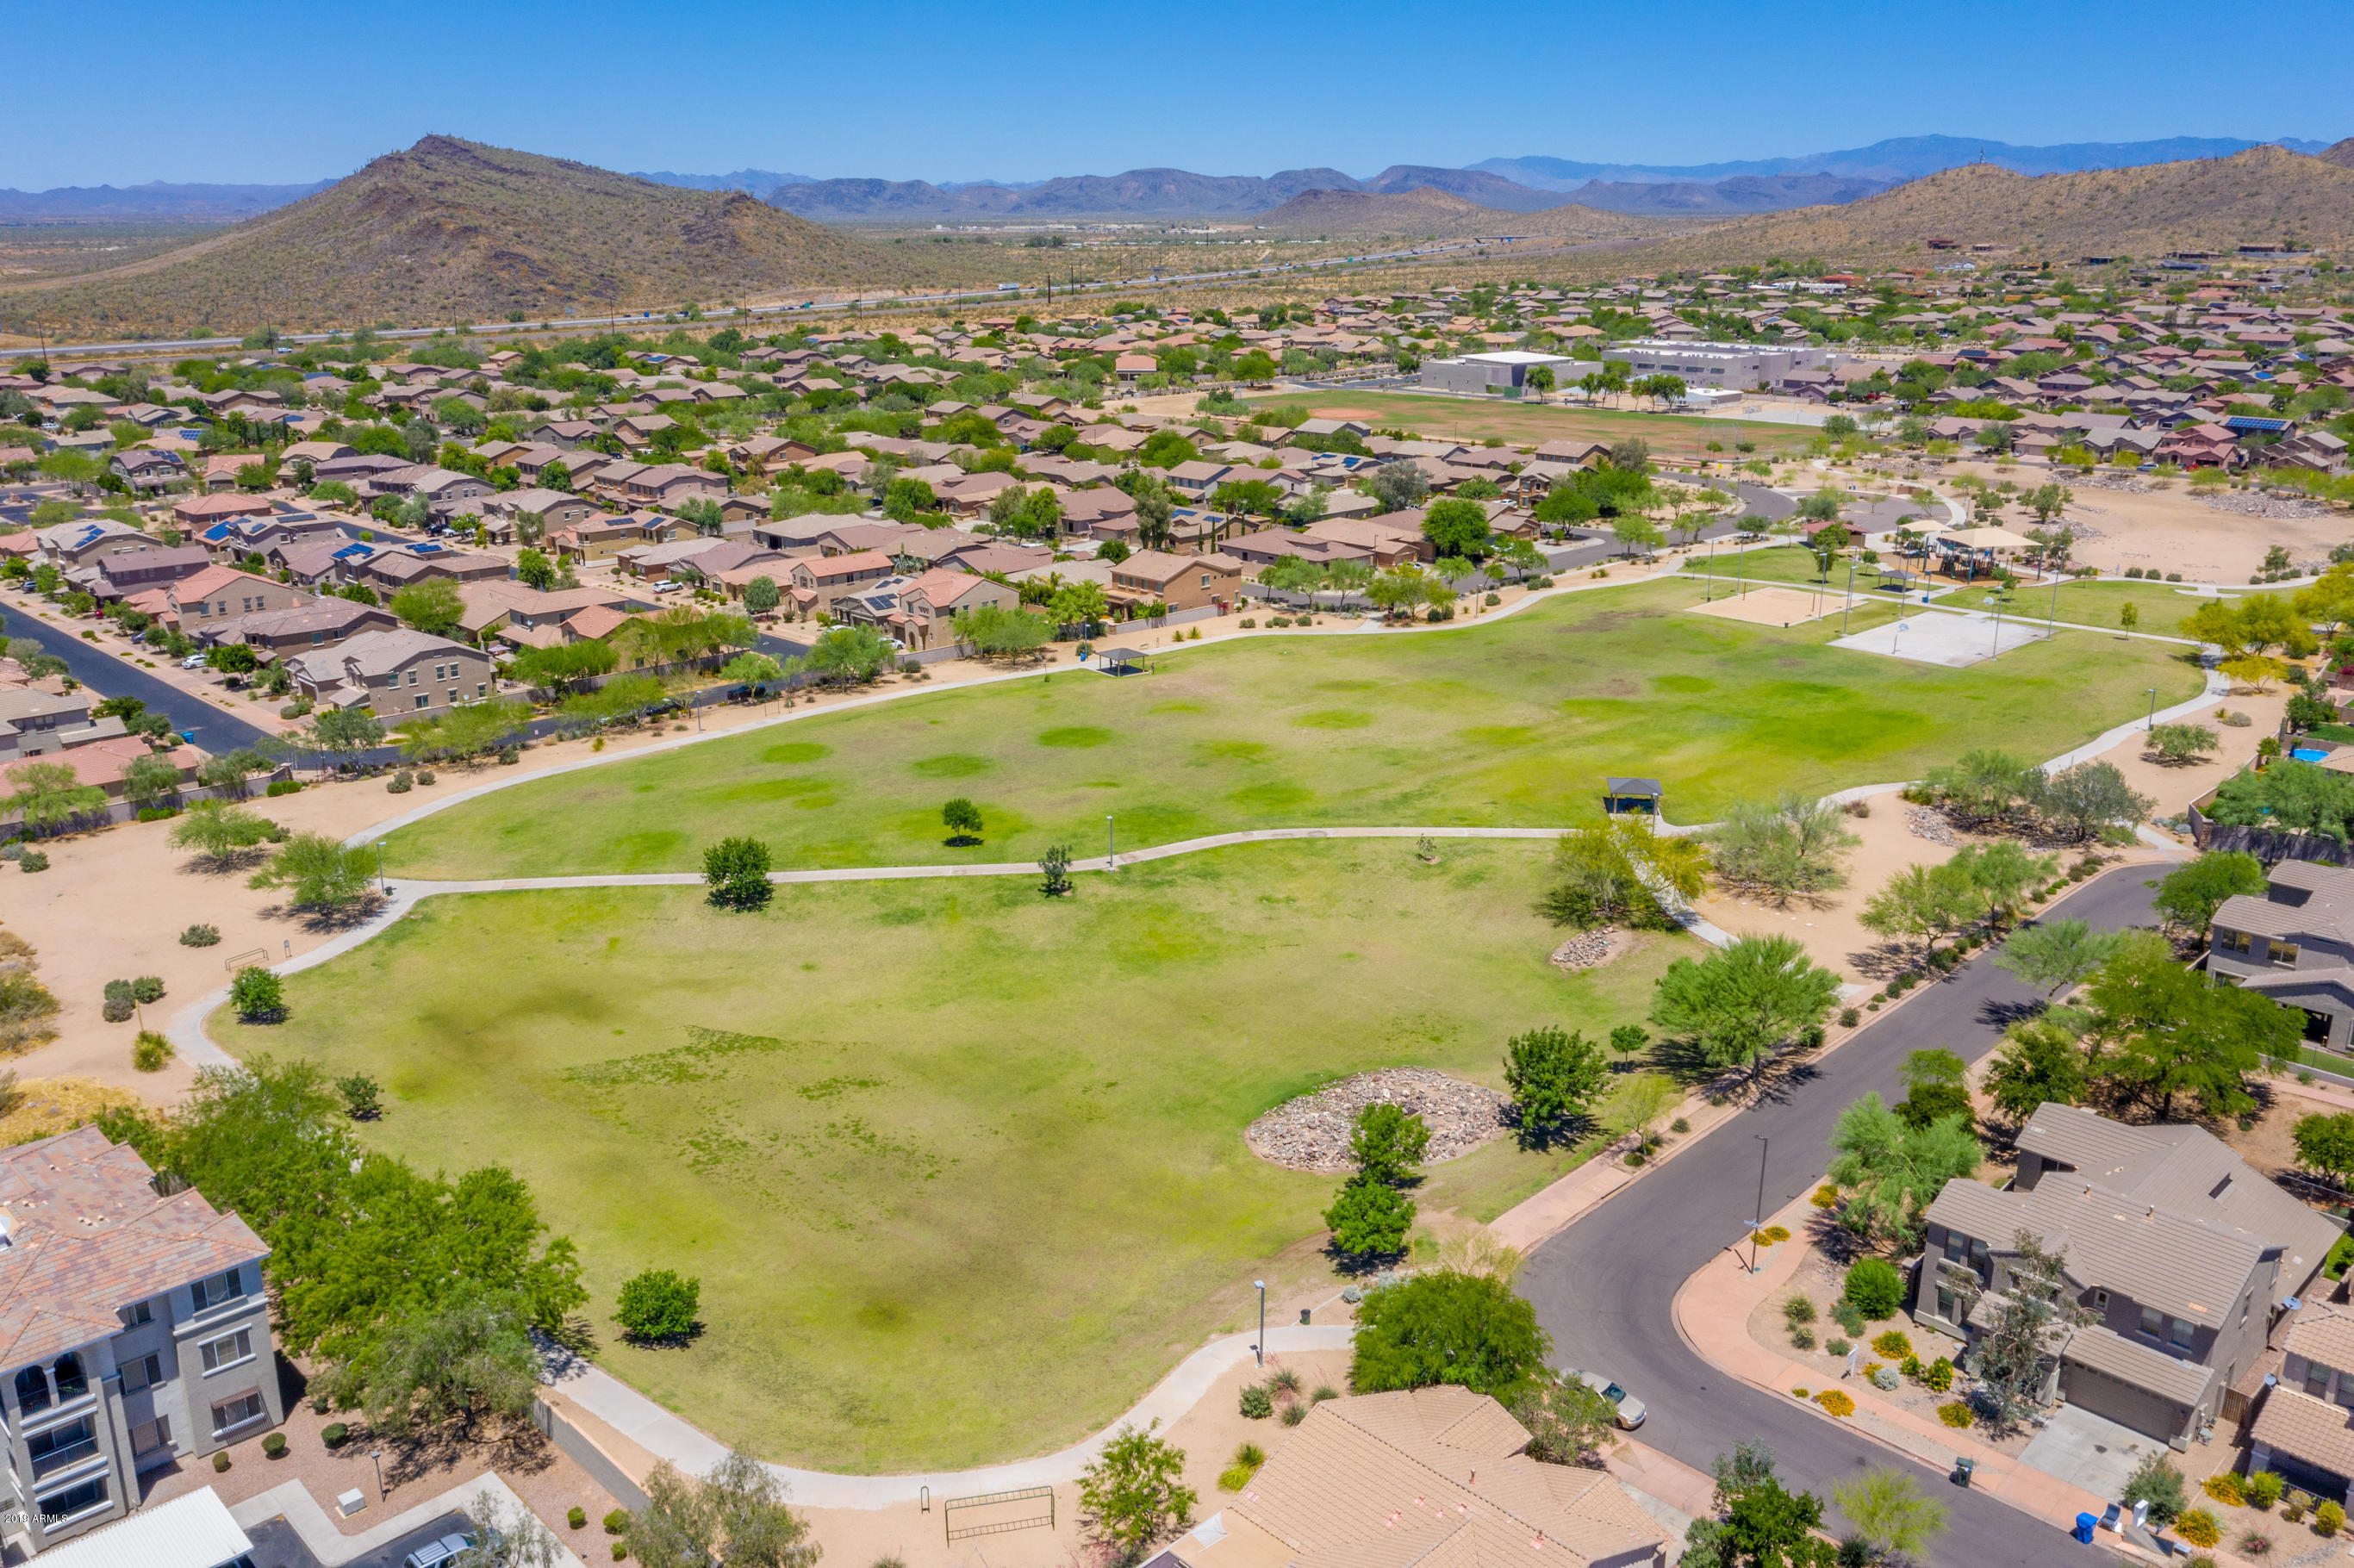 MLS 5940570 3002 W VIA DE PEDRO MIGUEL --, Phoenix, AZ 85086 Phoenix AZ Tramonto